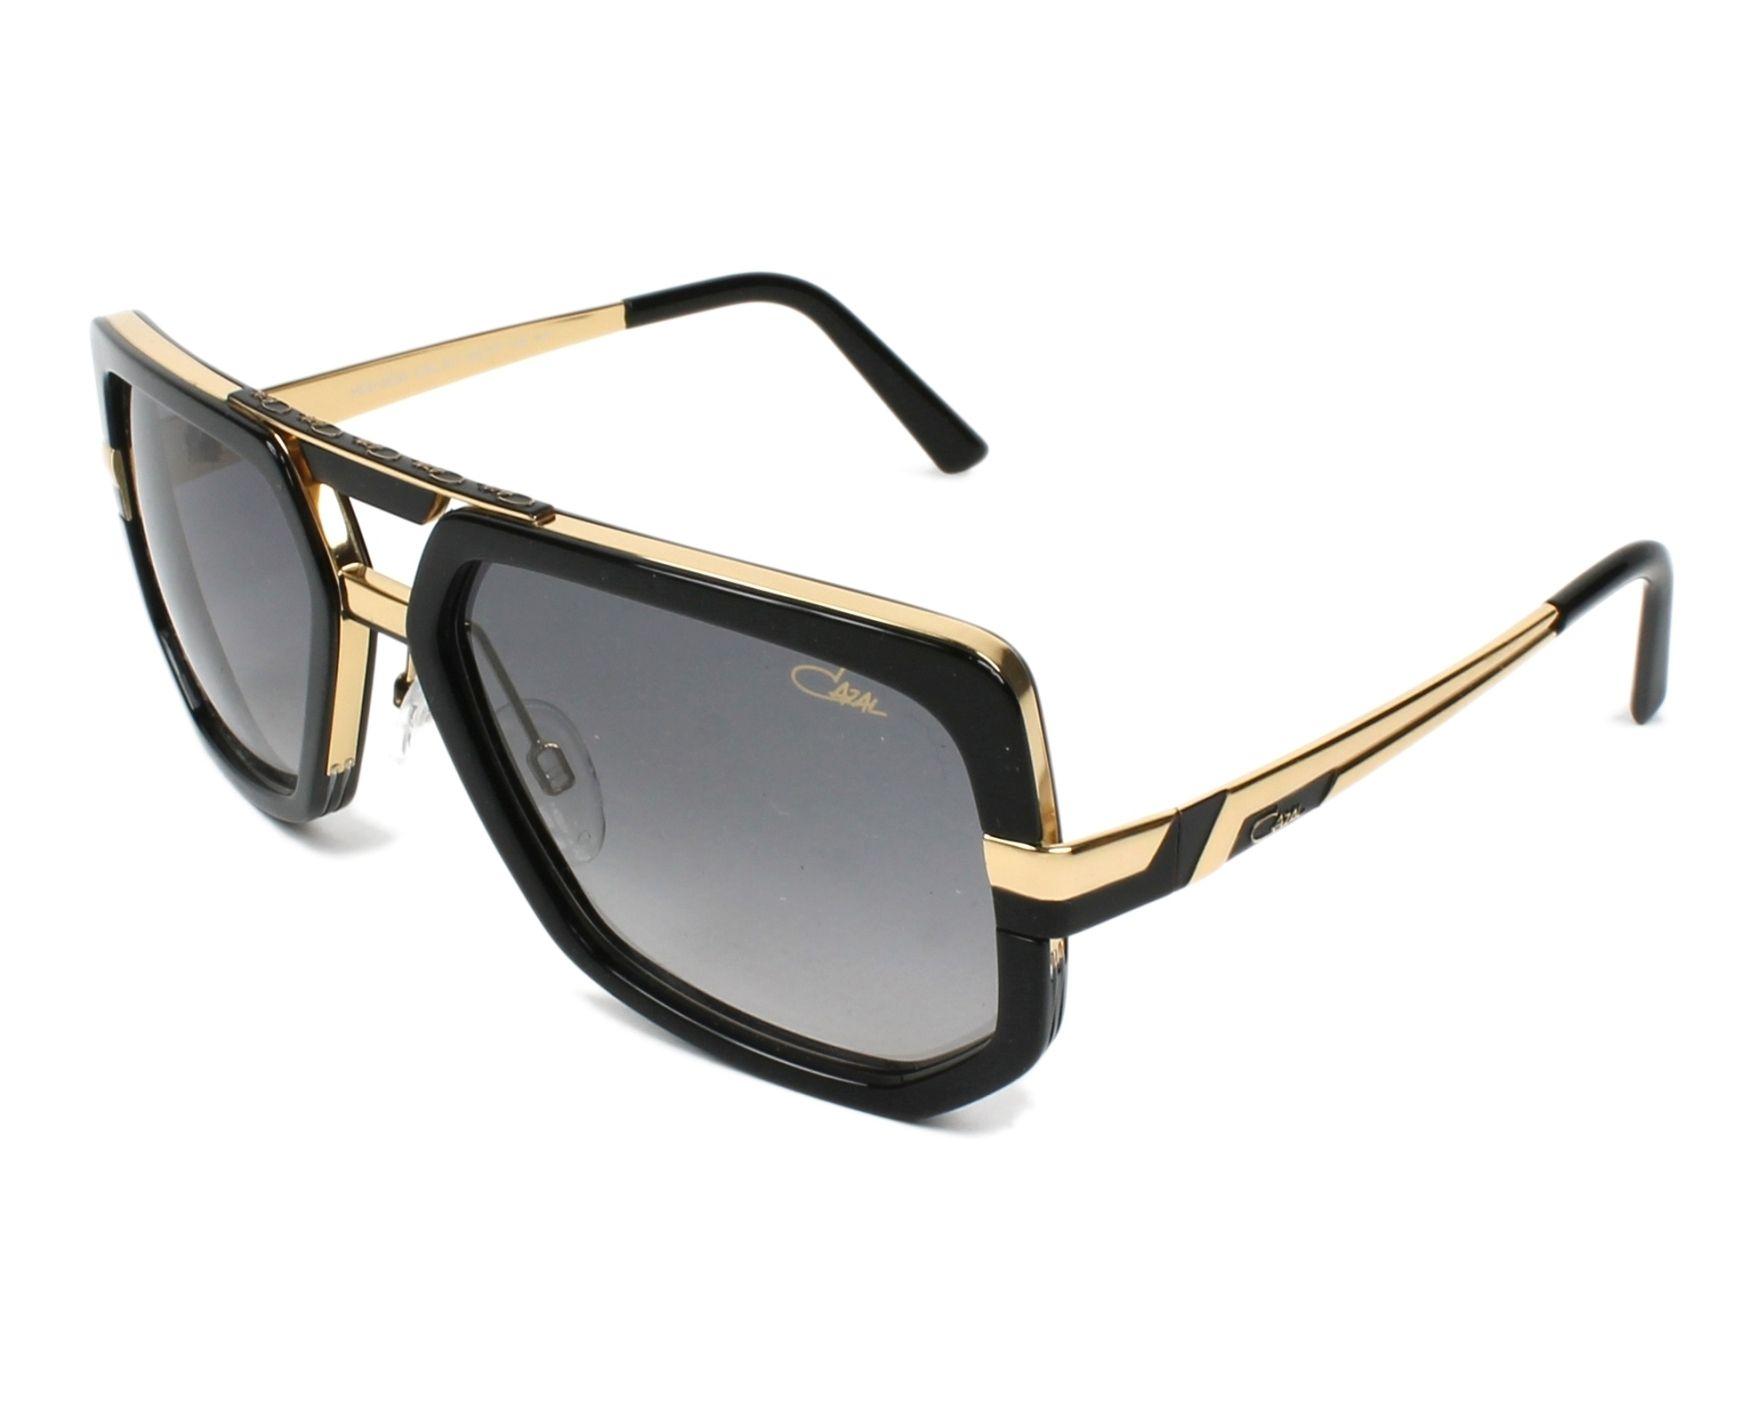 cazal sunglasses 662 3 001 60 visionet